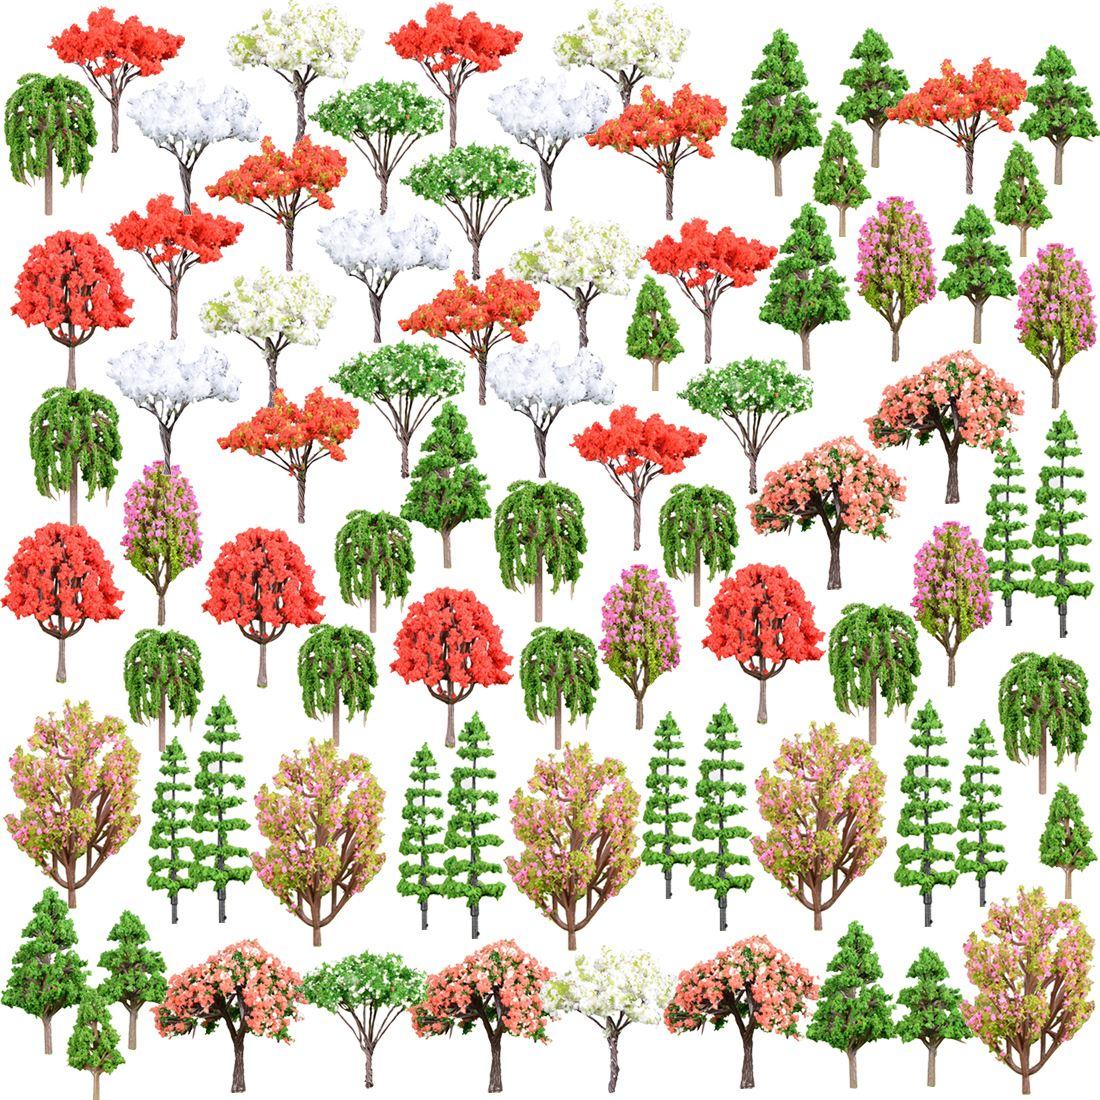 80 Uds 4,2-9,7 cm (1,65-3,8 pulgadas) escala HO 1 85 manzana árbol modelo arquitectura del ferrocarril Diorama árbol para paisaje DIY